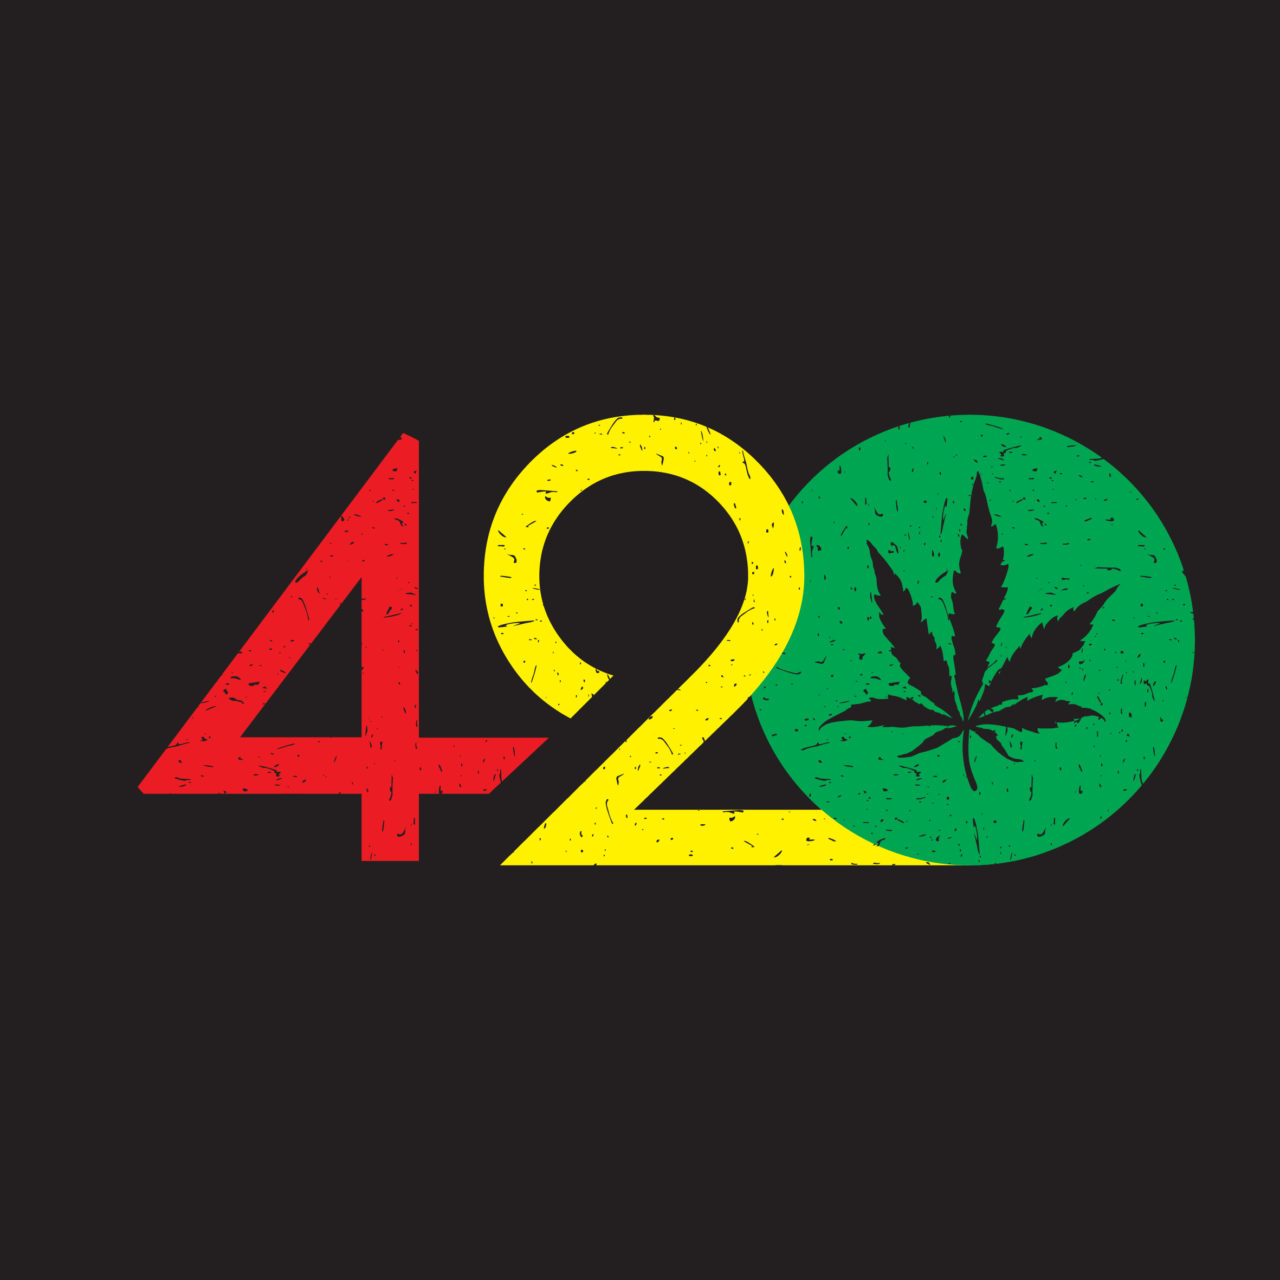 420.2-1280x1280.jpg